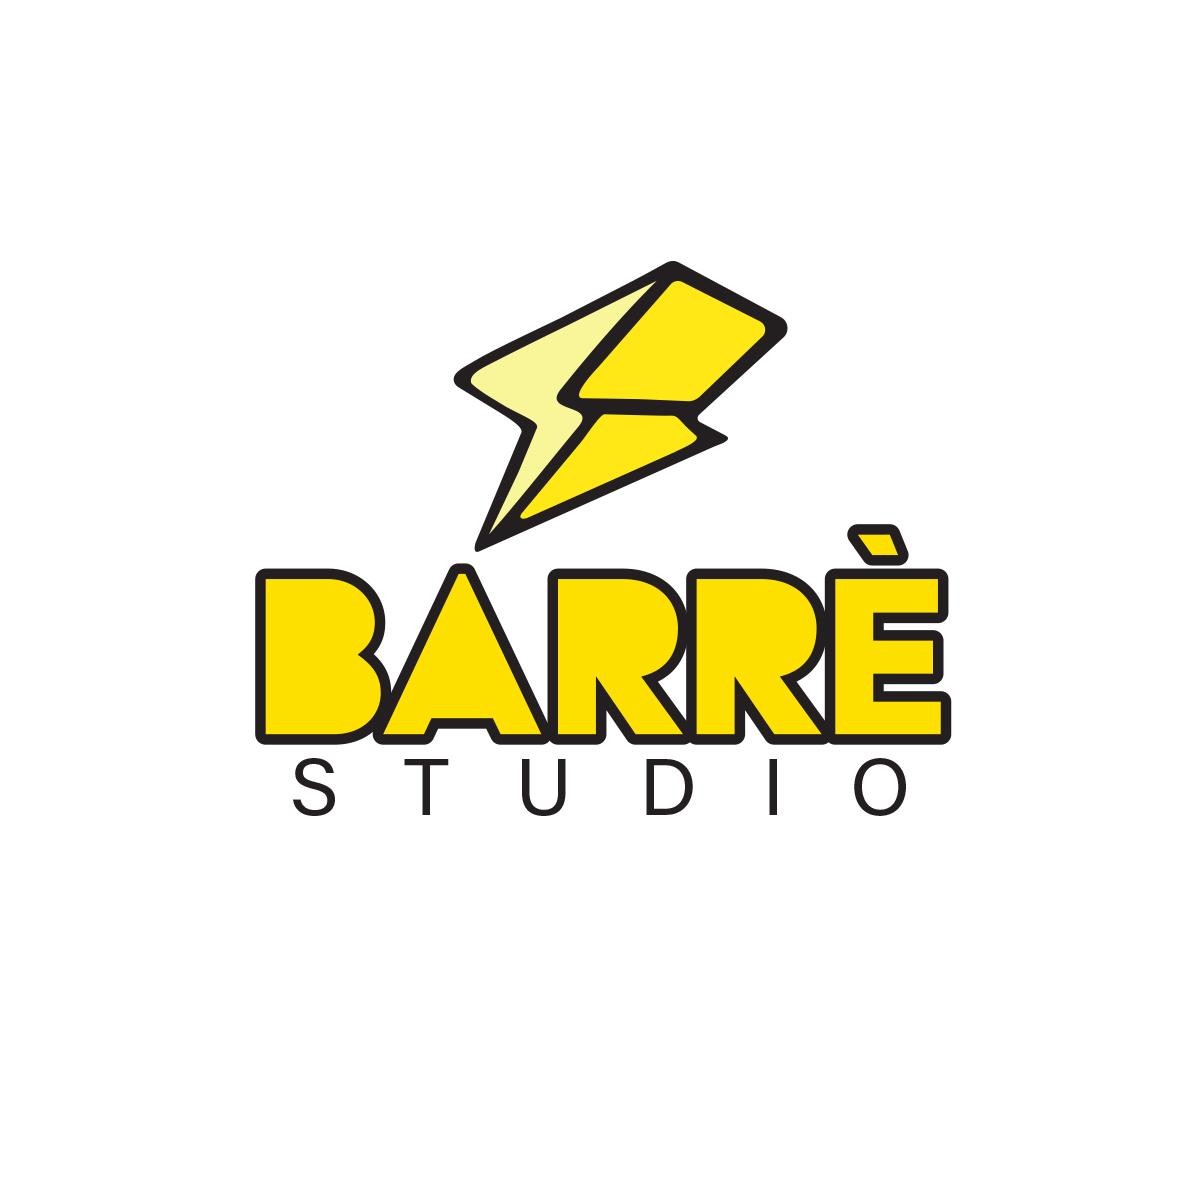 Barre Animation Studio Company Logo Design Ideas On Behance